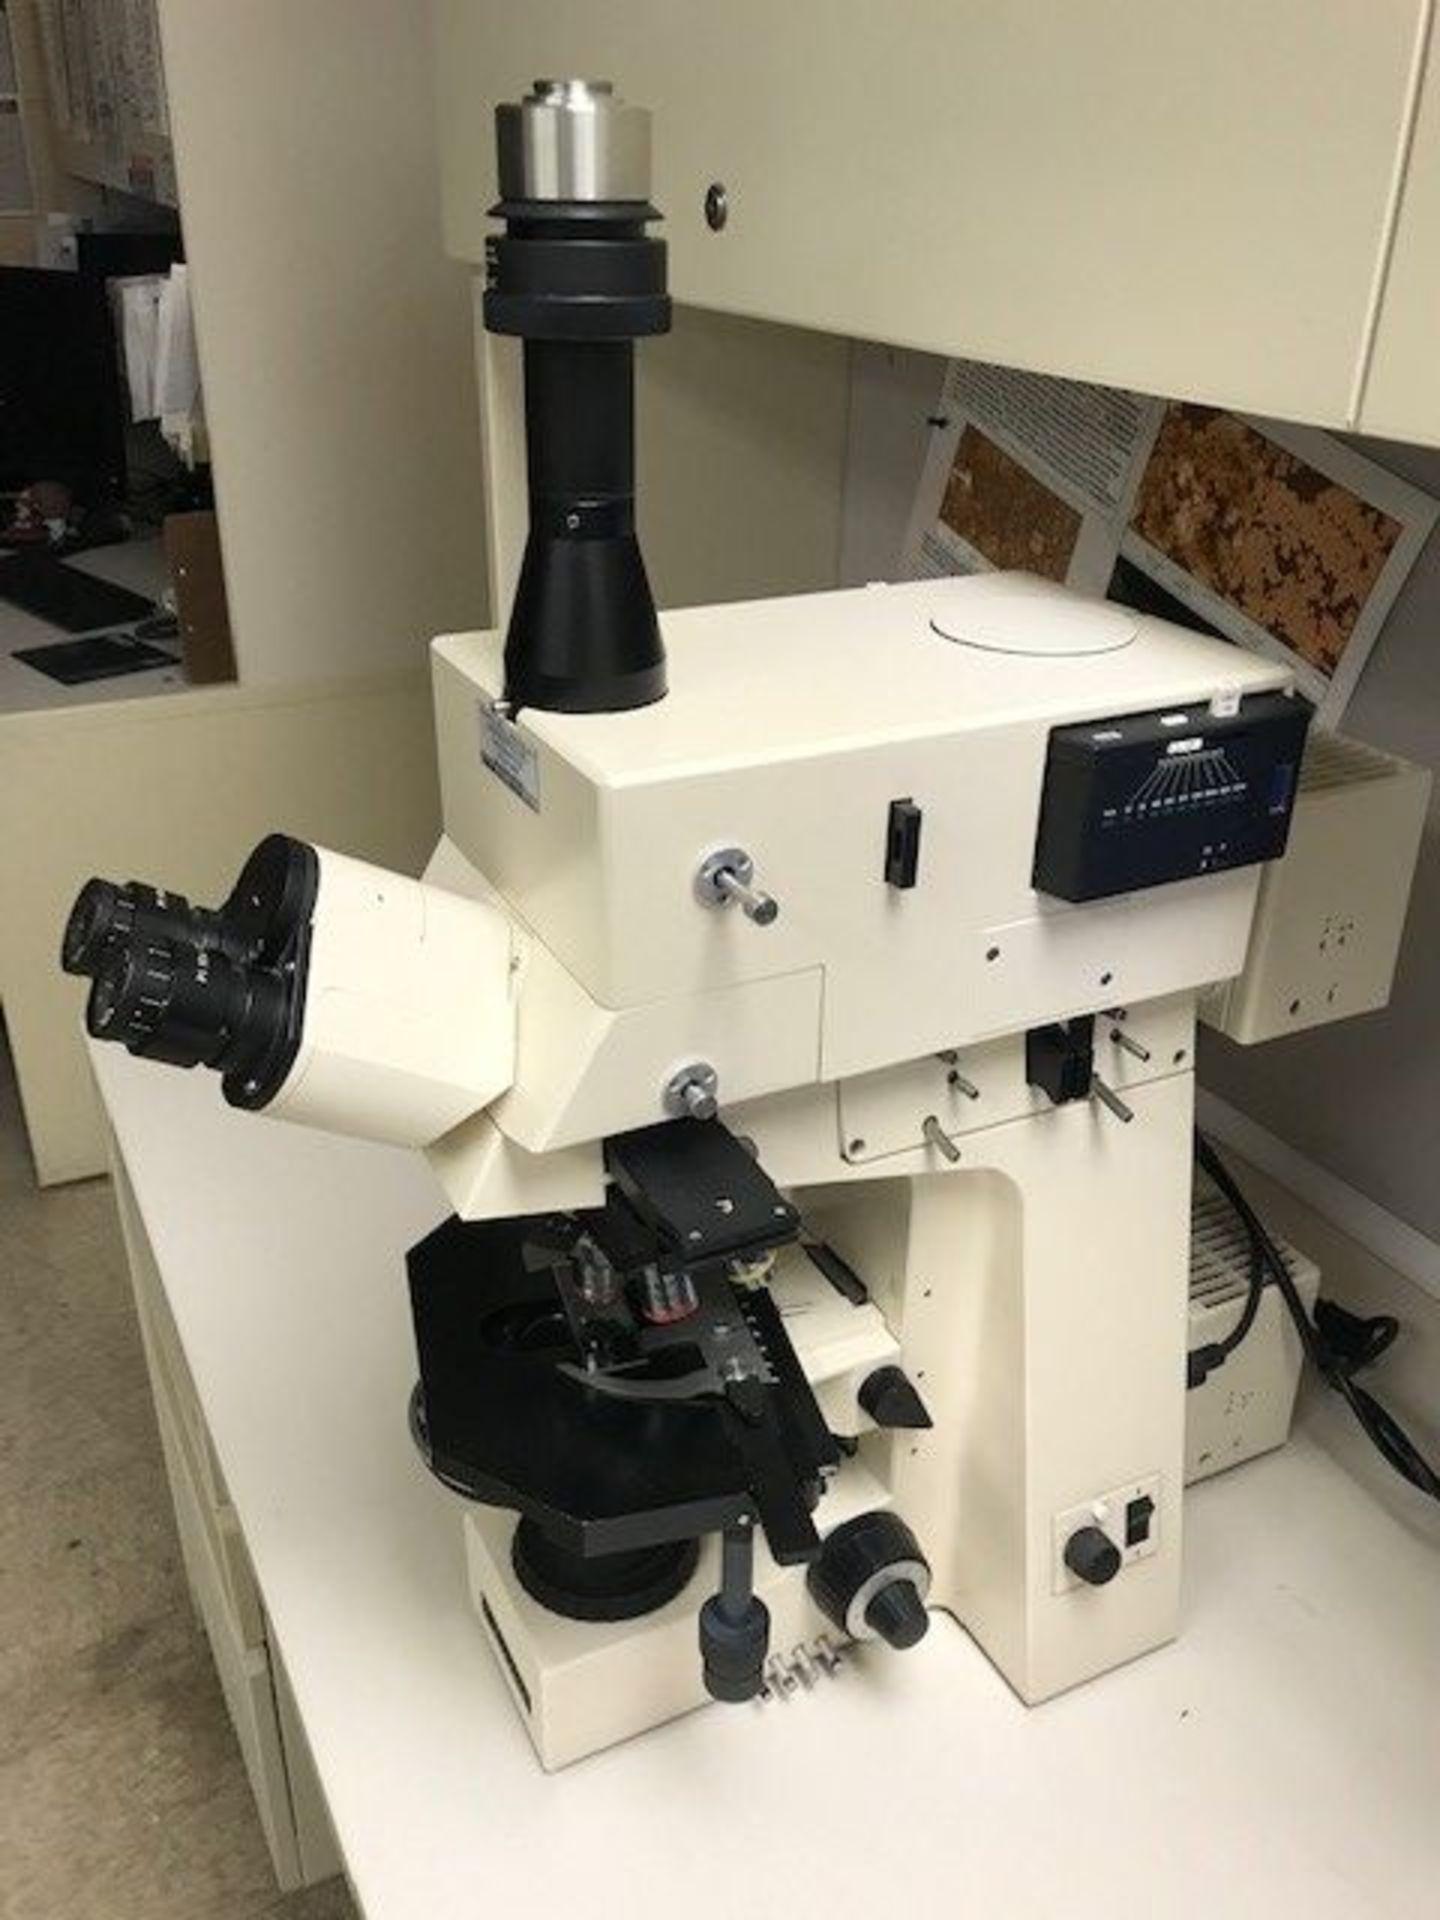 Nikon Optiphot Transmission Microscope